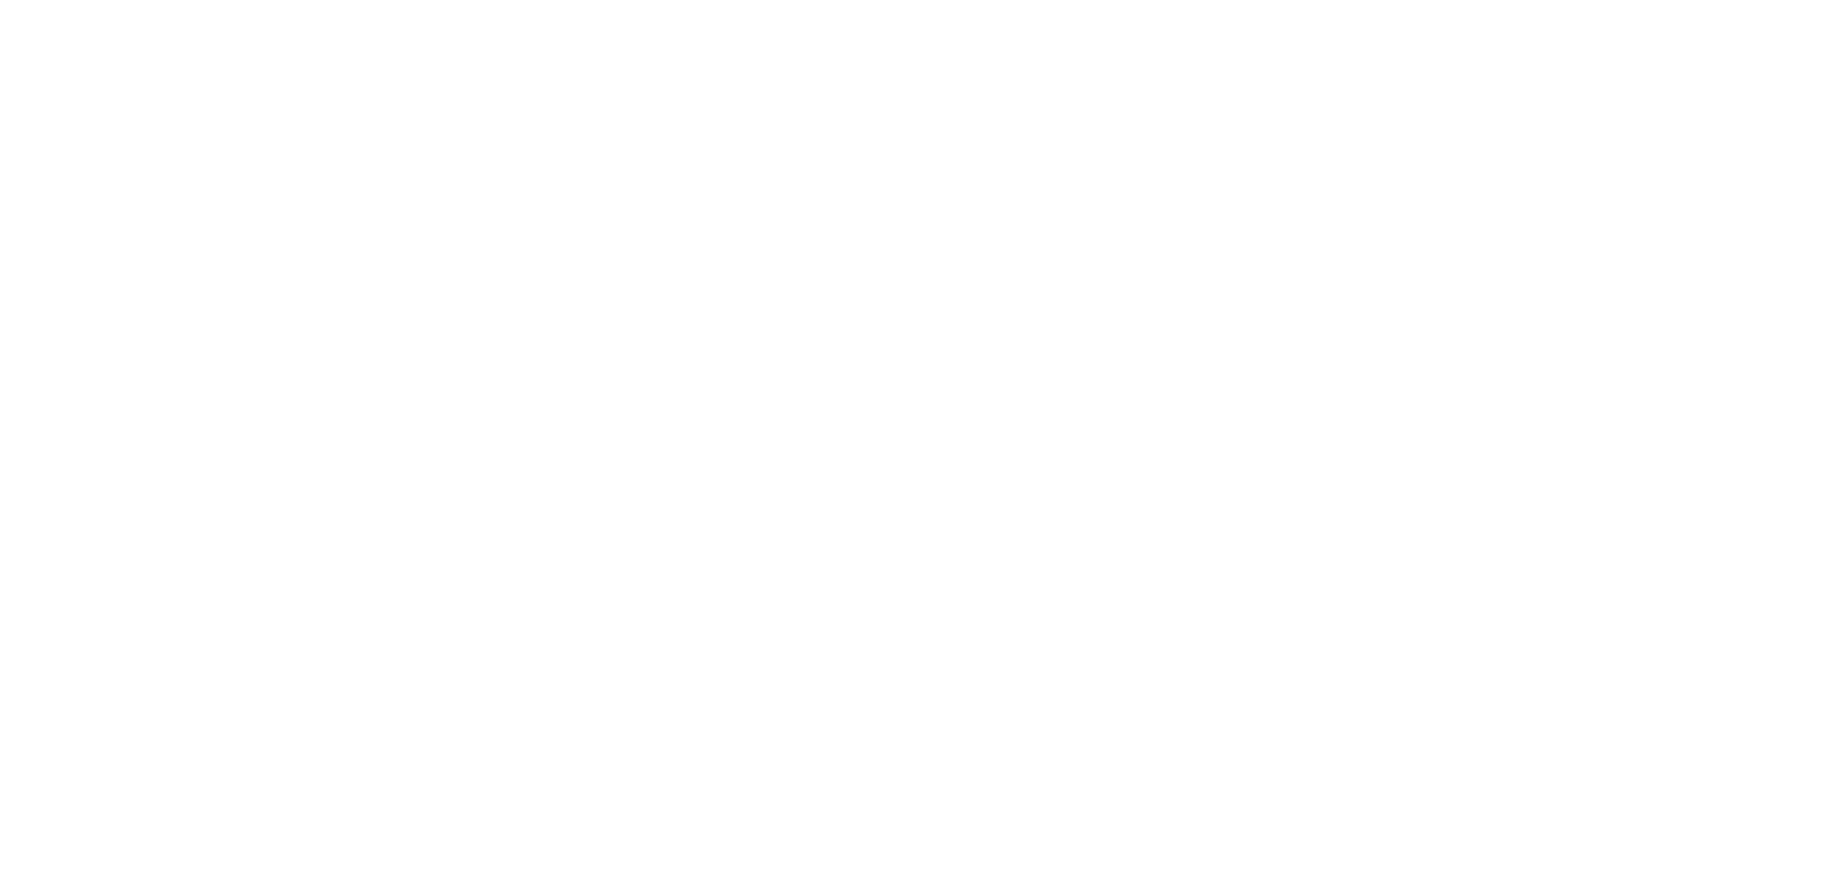 EFICAS